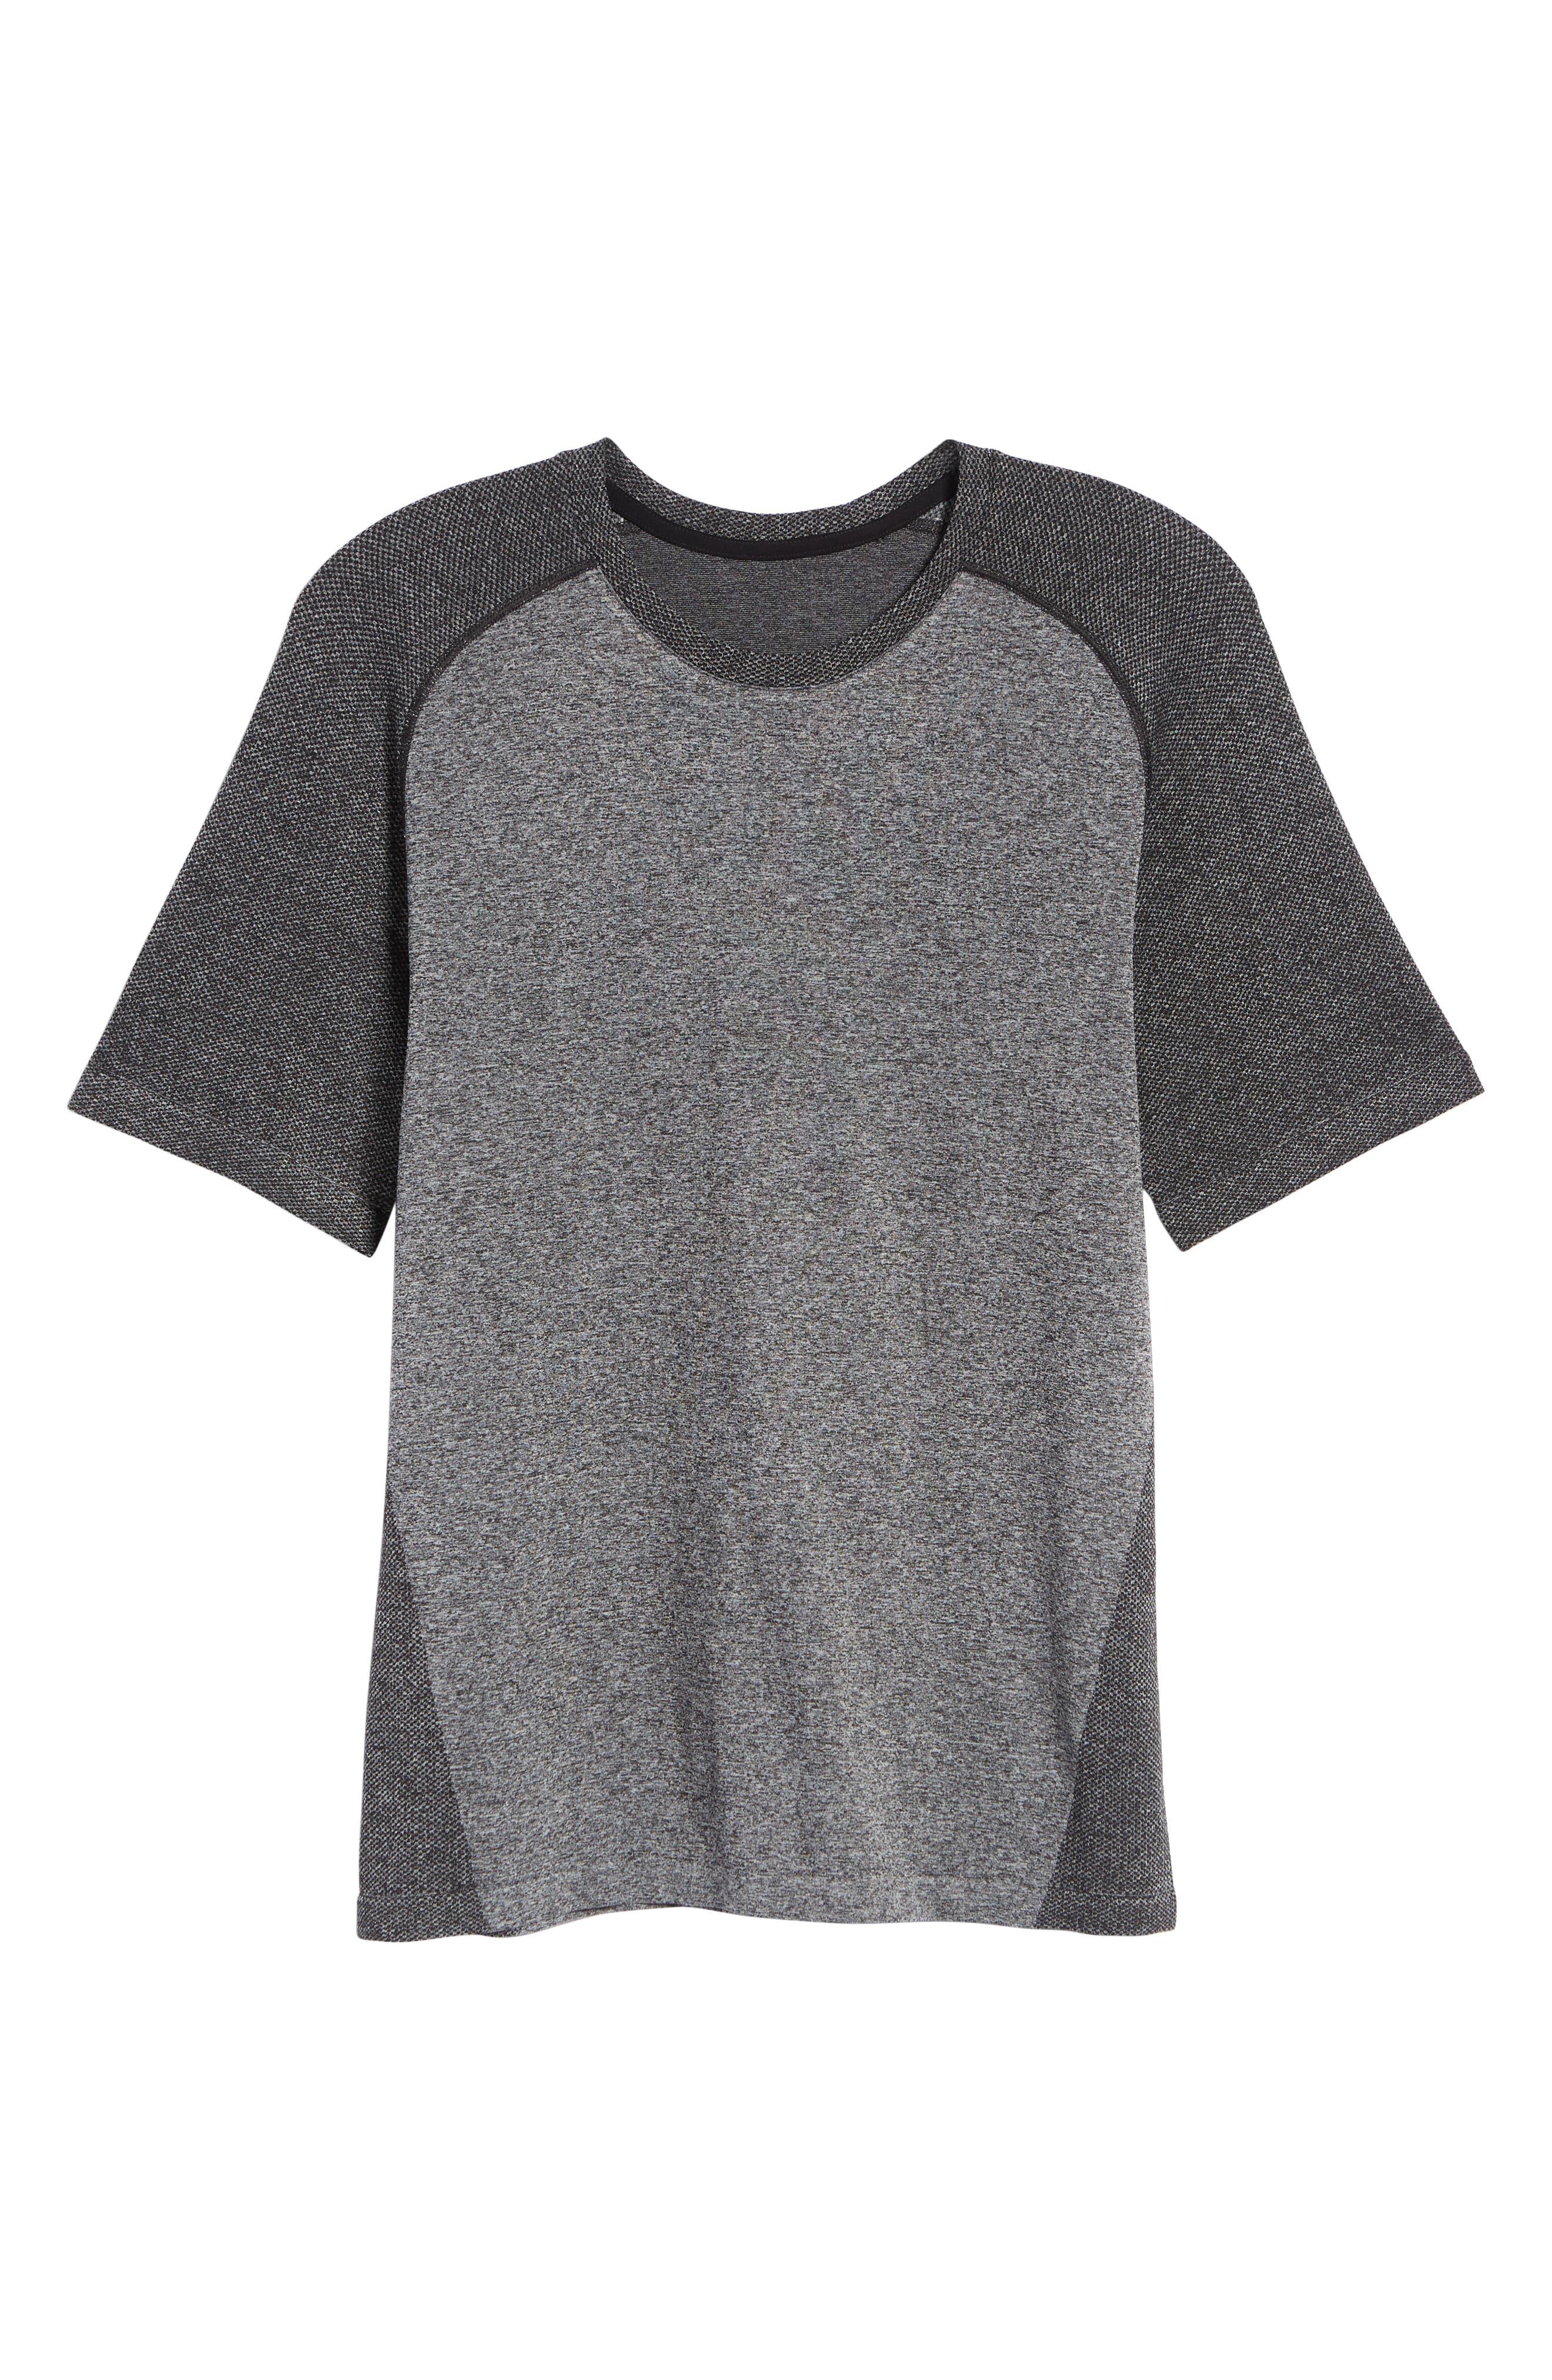 ZELLA, Seamless Raglan T-Shirt, Alternate thumbnail 7, color, BLACK OXIDE MELANGE